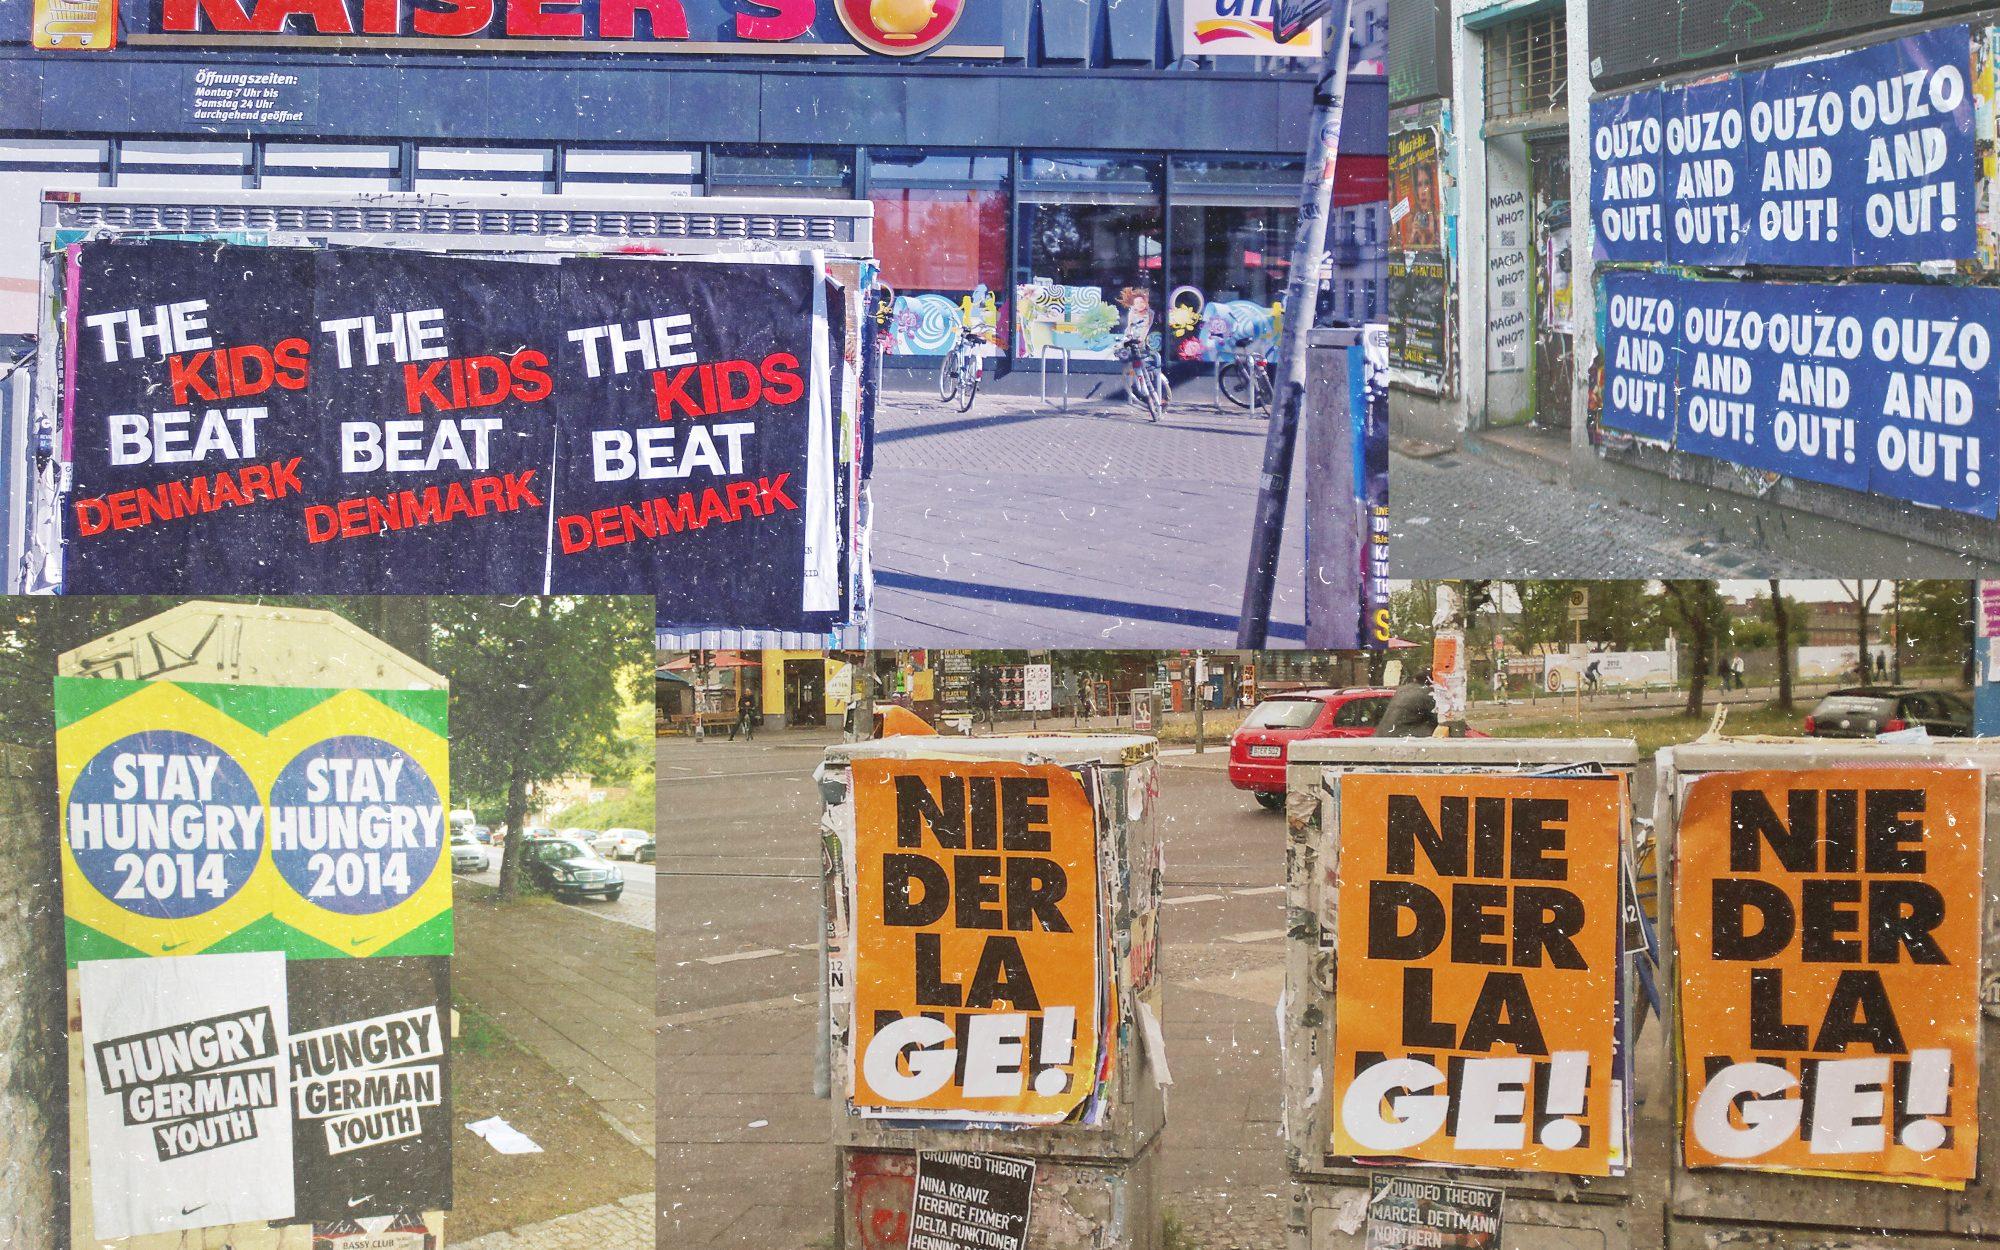 GRACO-Nike-Guerilla-Postering